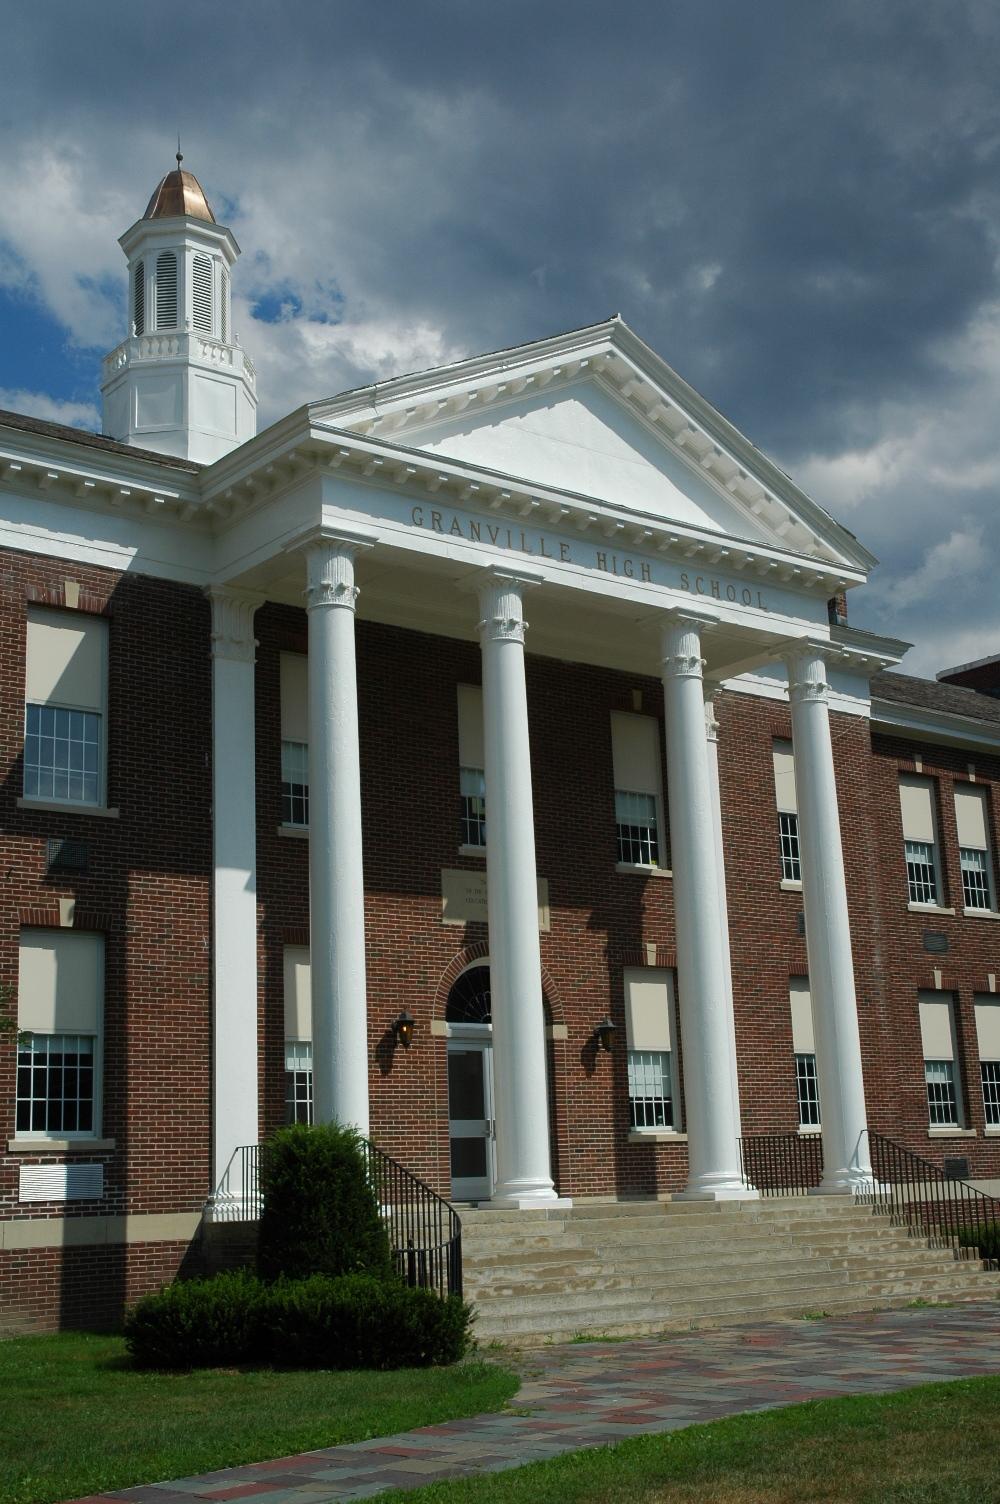 School planning virtual and in-person graduation ceremonies